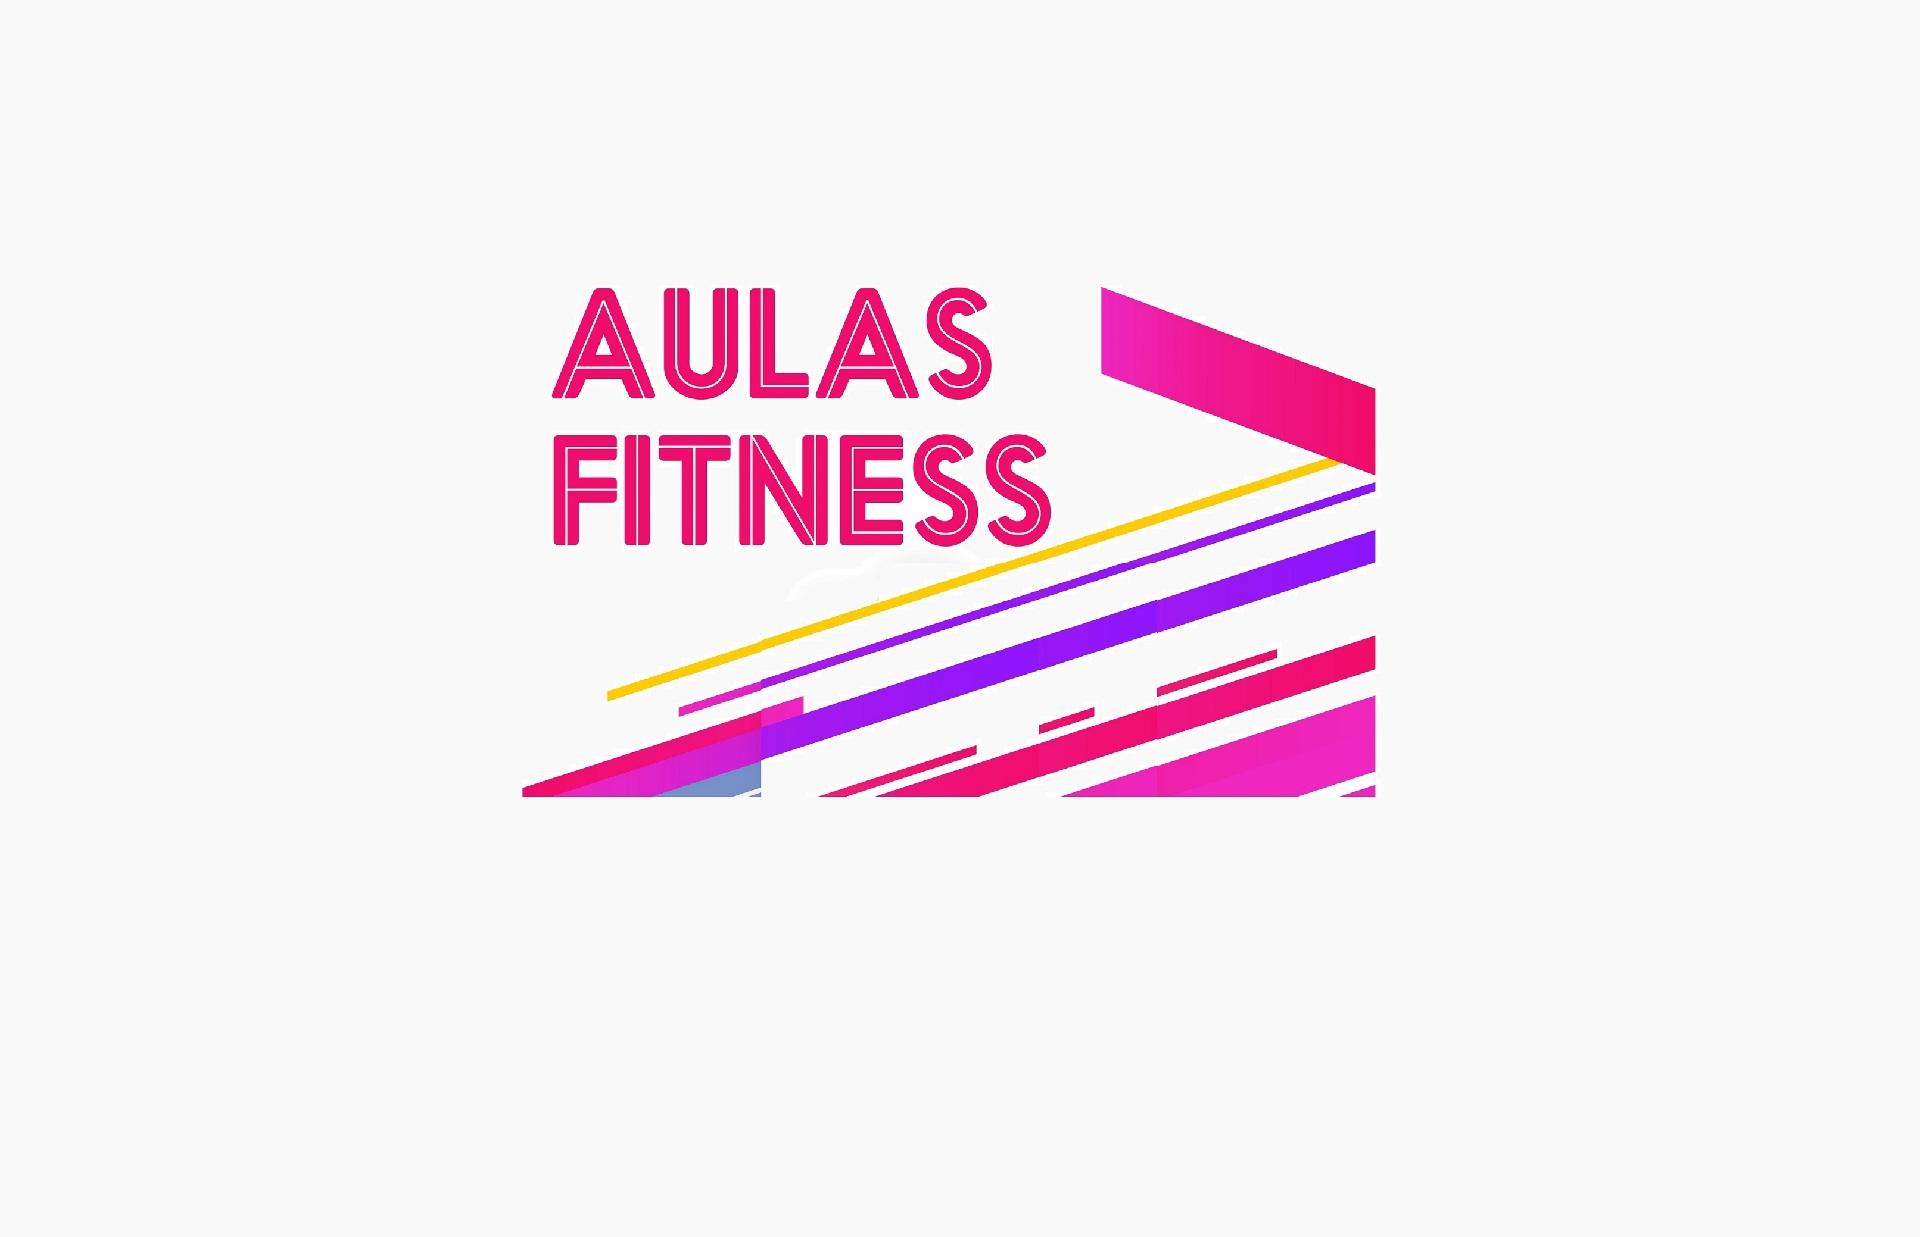 Aulas Fitness 2021